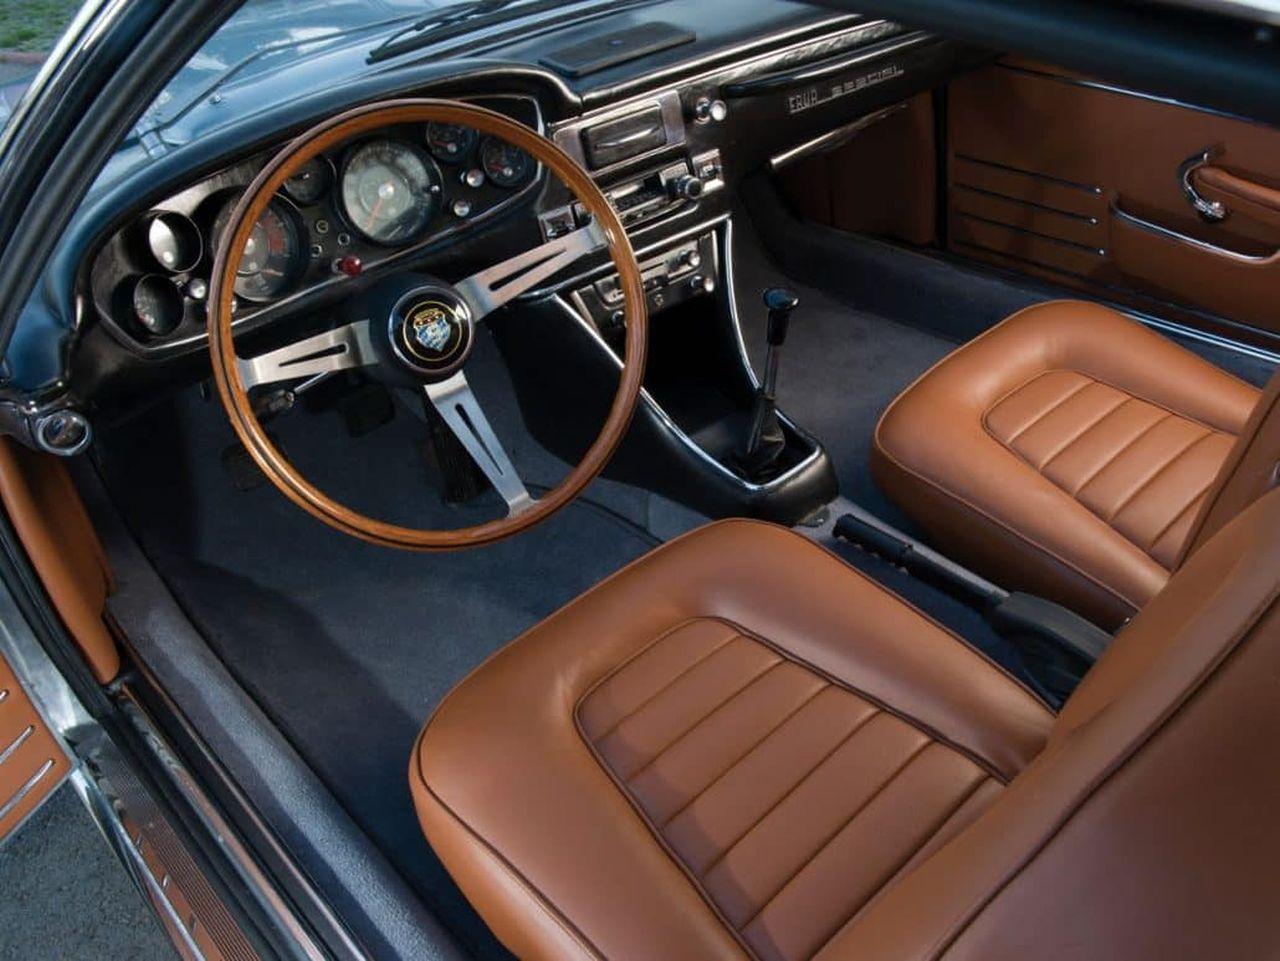 BMW-Glas 3000 V8 Fastback Coupé - J'ai plus de souffle ! 2